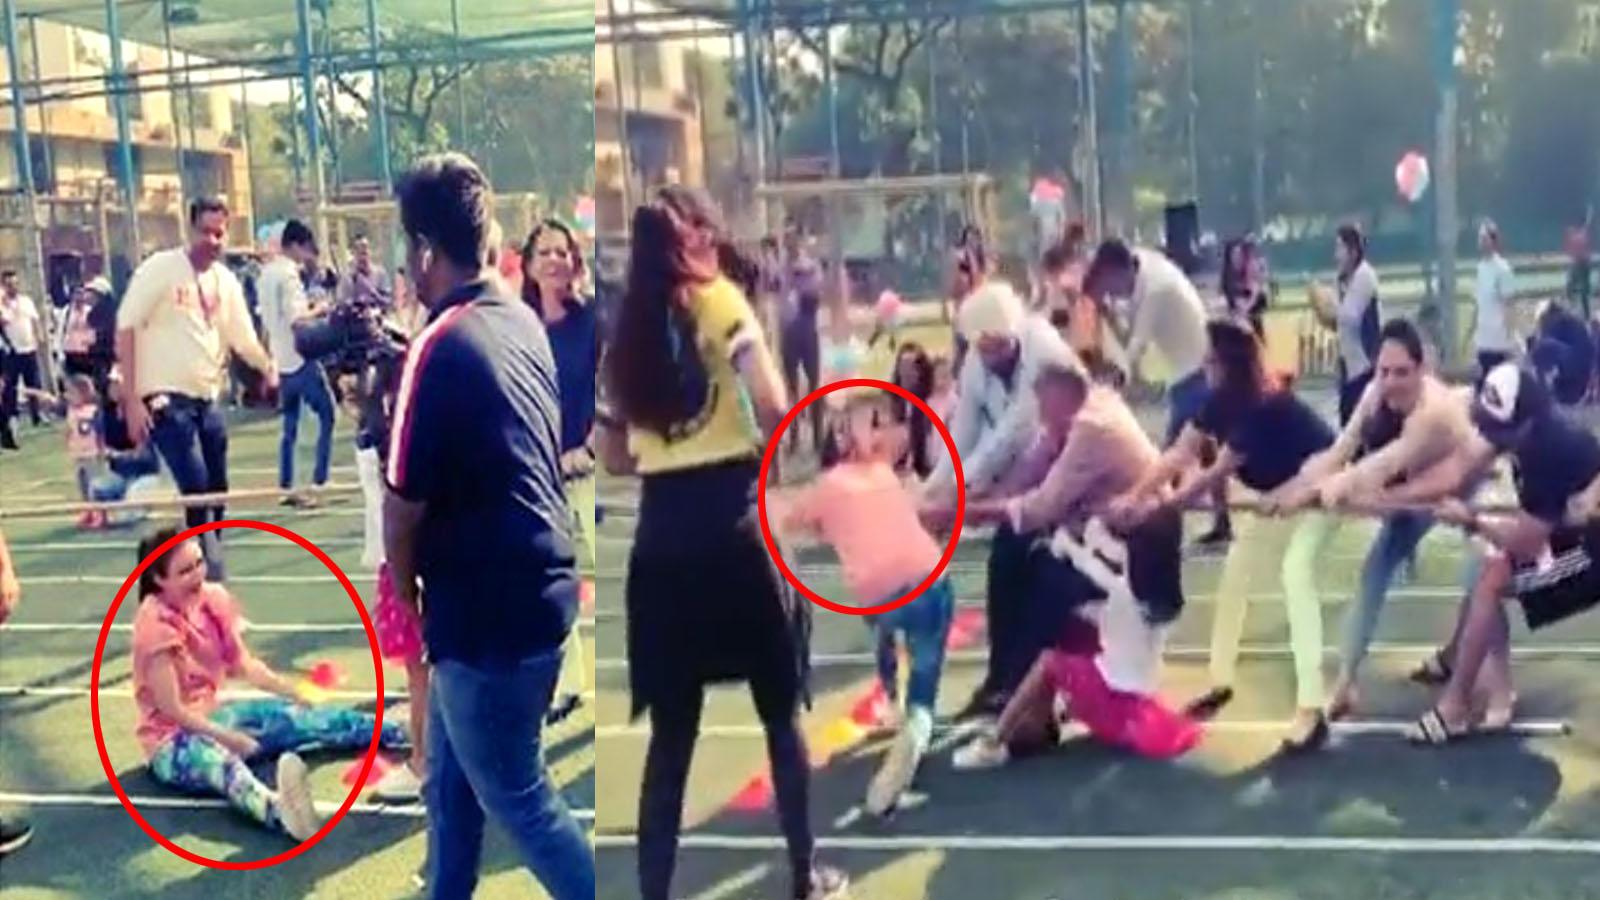 Watch: Soha Ali Khan plays tug of war at daughter Inaaya Naumi Kemmu's sports day celebration